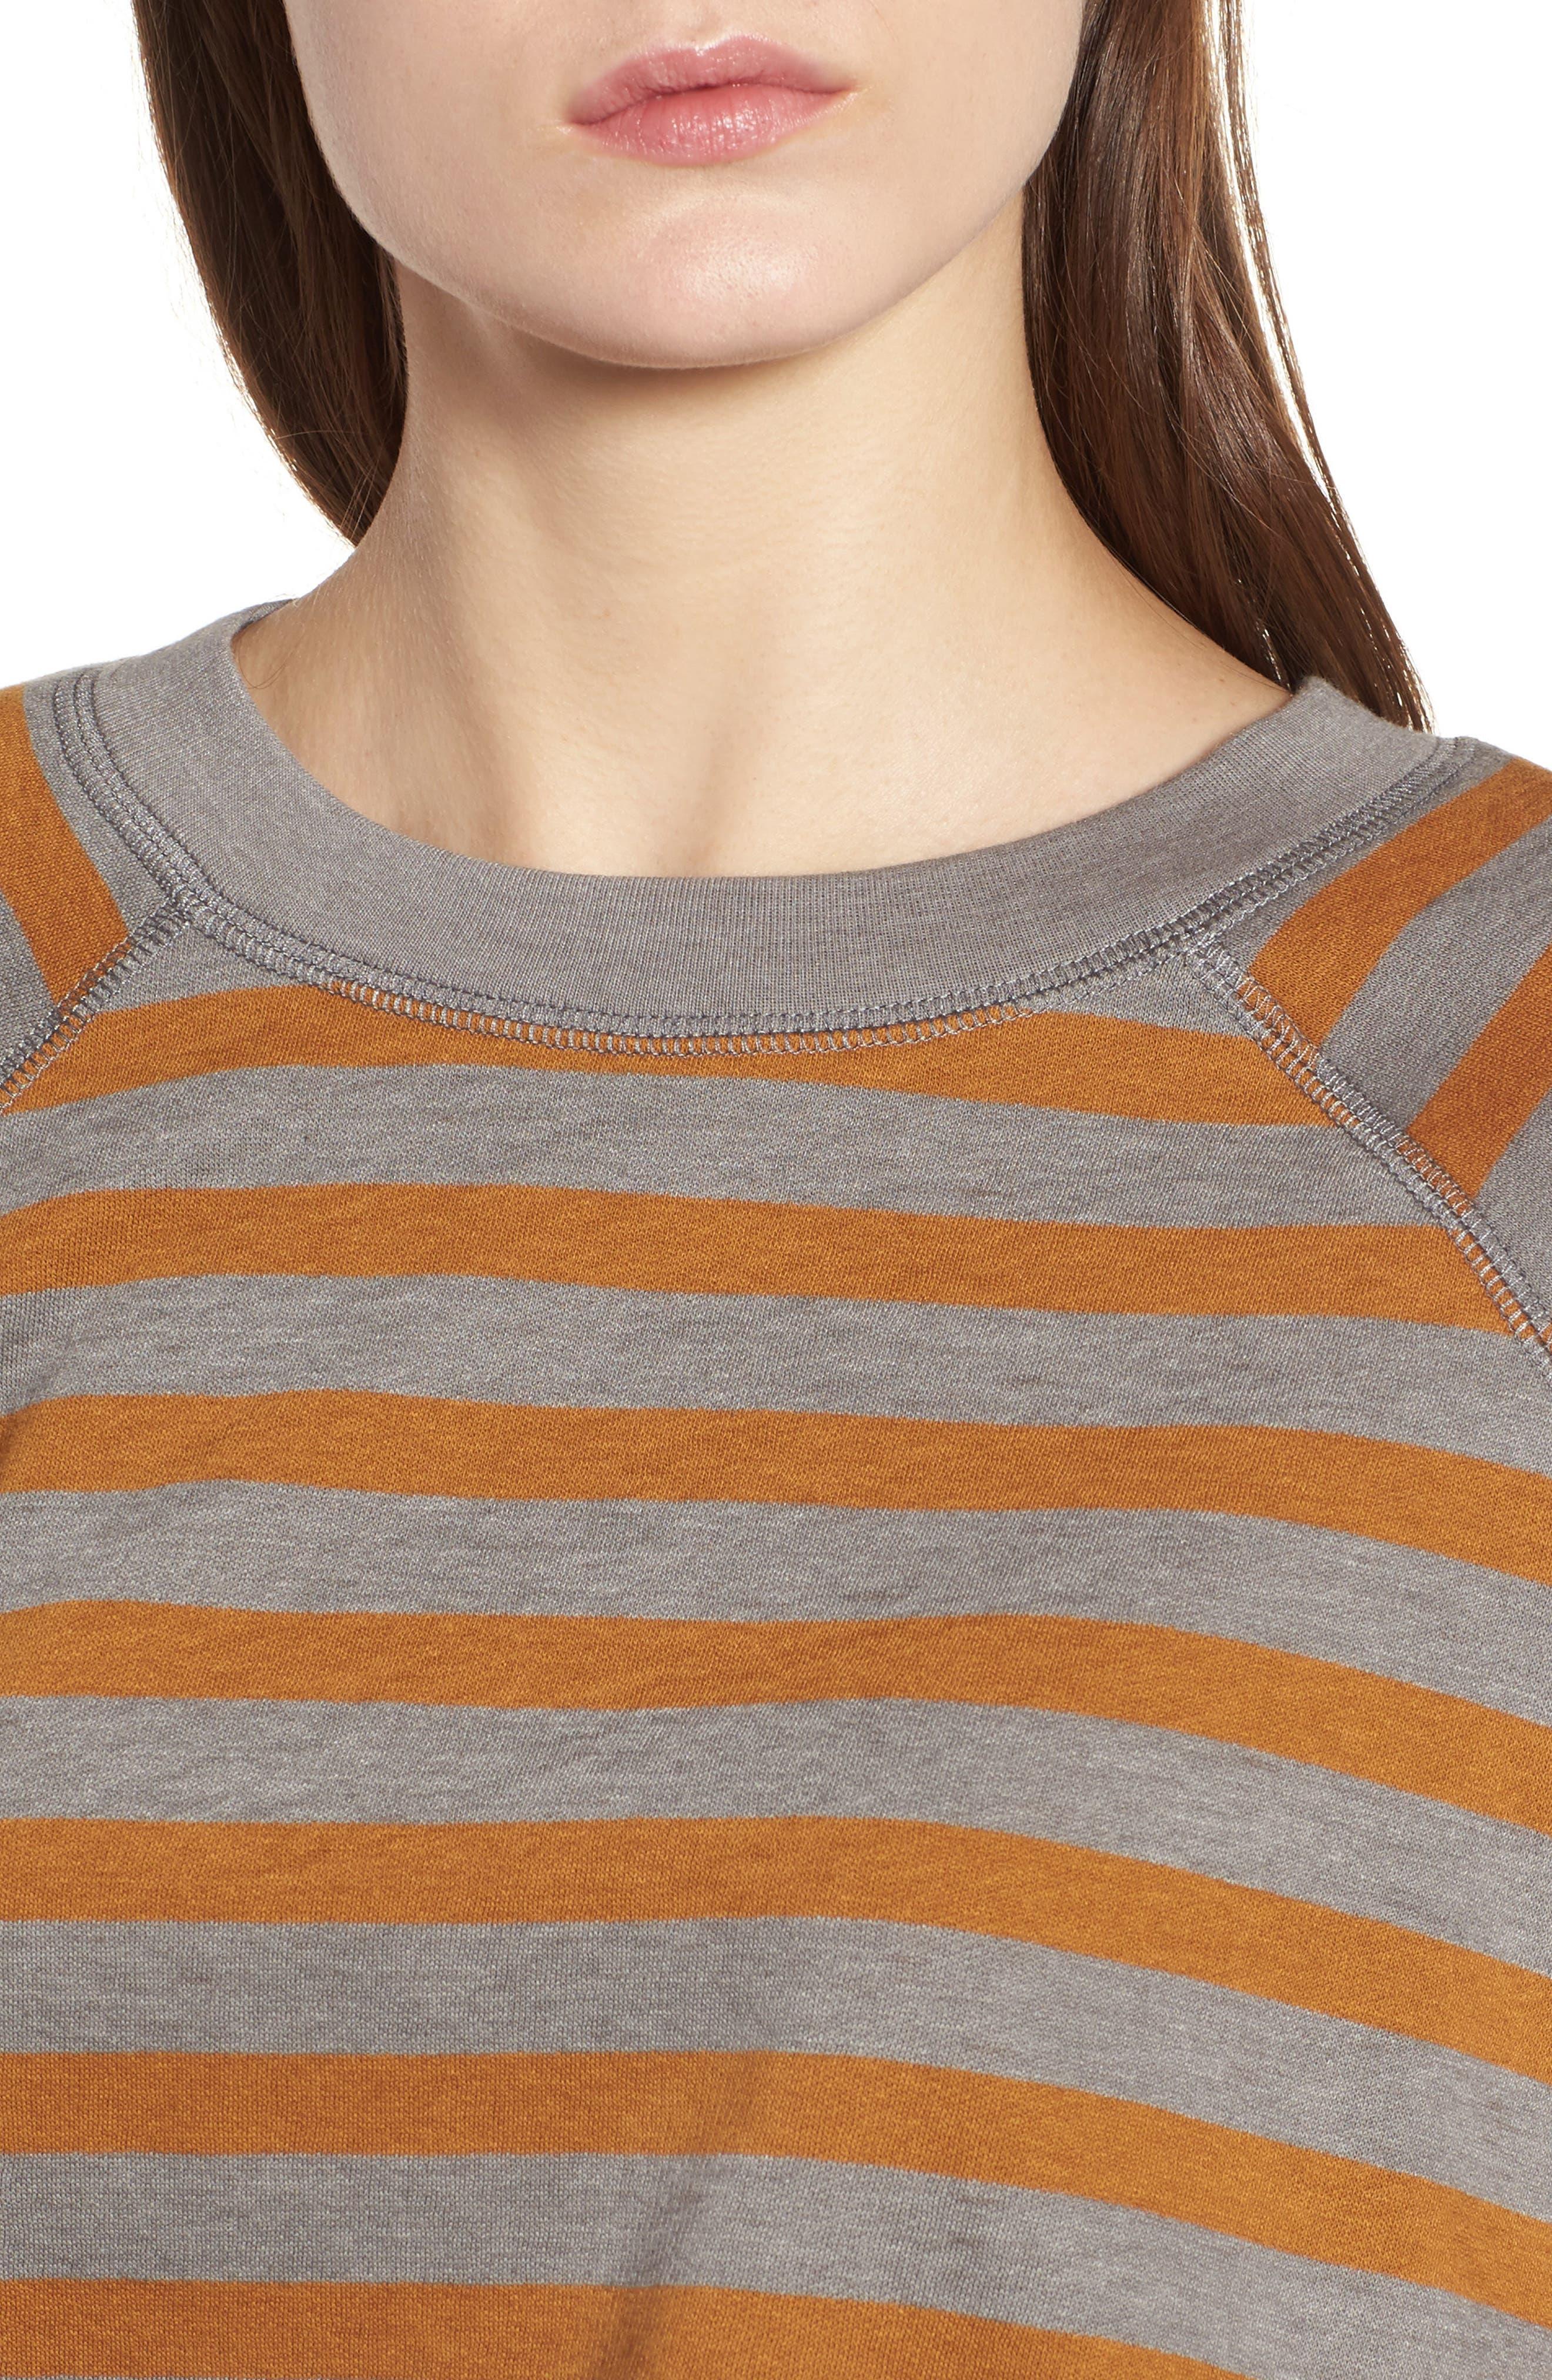 Crewneck Sweatshirt,                             Alternate thumbnail 4, color,                             021